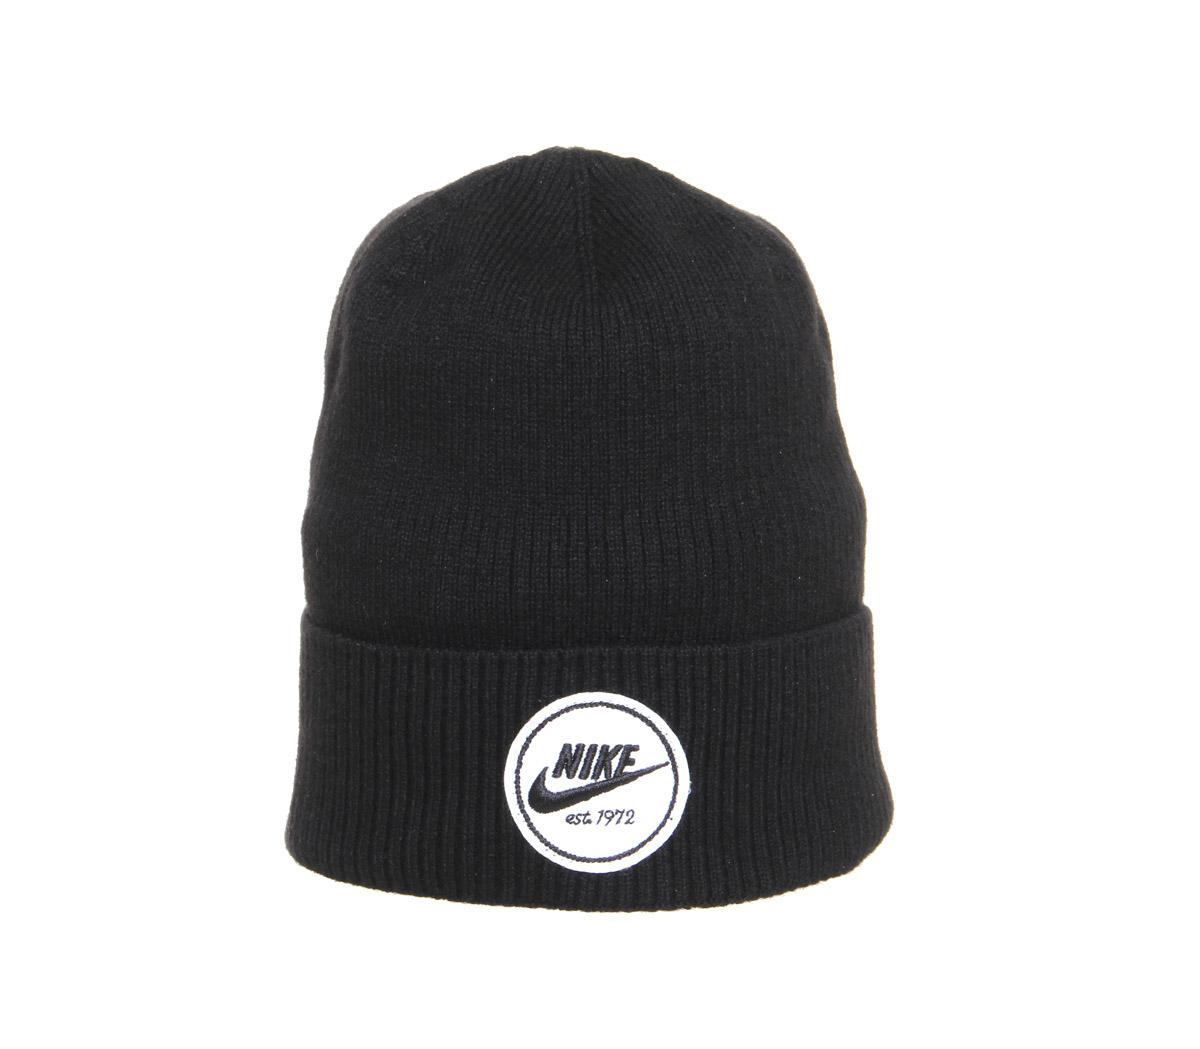 12cf4993b4f Nike Beanie Cuffed Core in Black for Men - Lyst